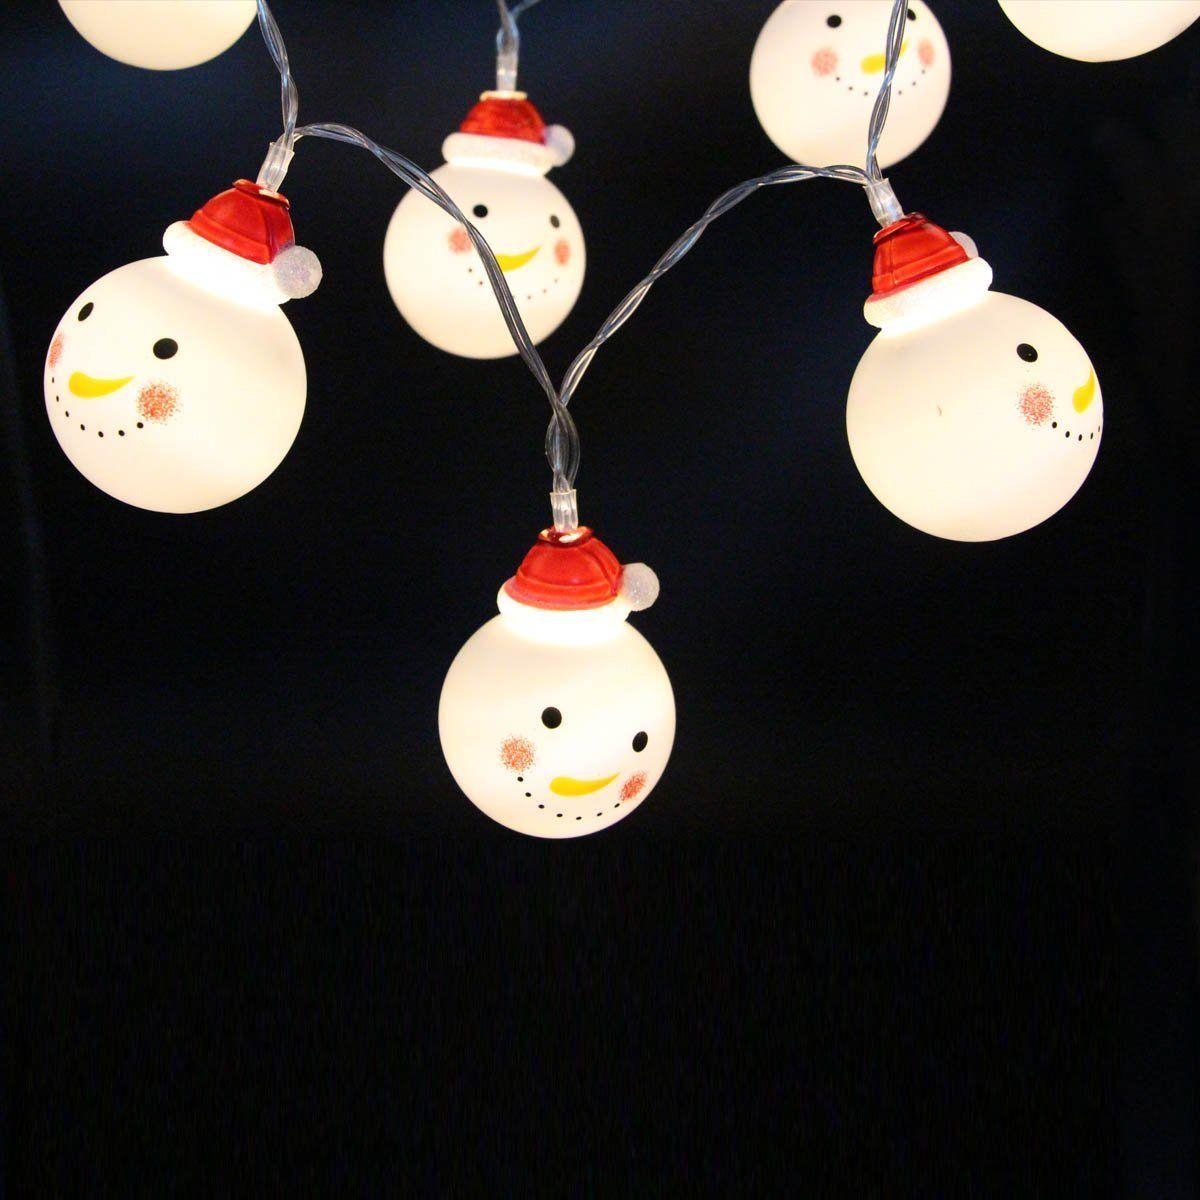 20 LEDs Schneemann LED Lichterketten 1m 10 LEDs batteriebetrieben 5m 30 LEDs Lichter warmweiß rgb Weihnachten